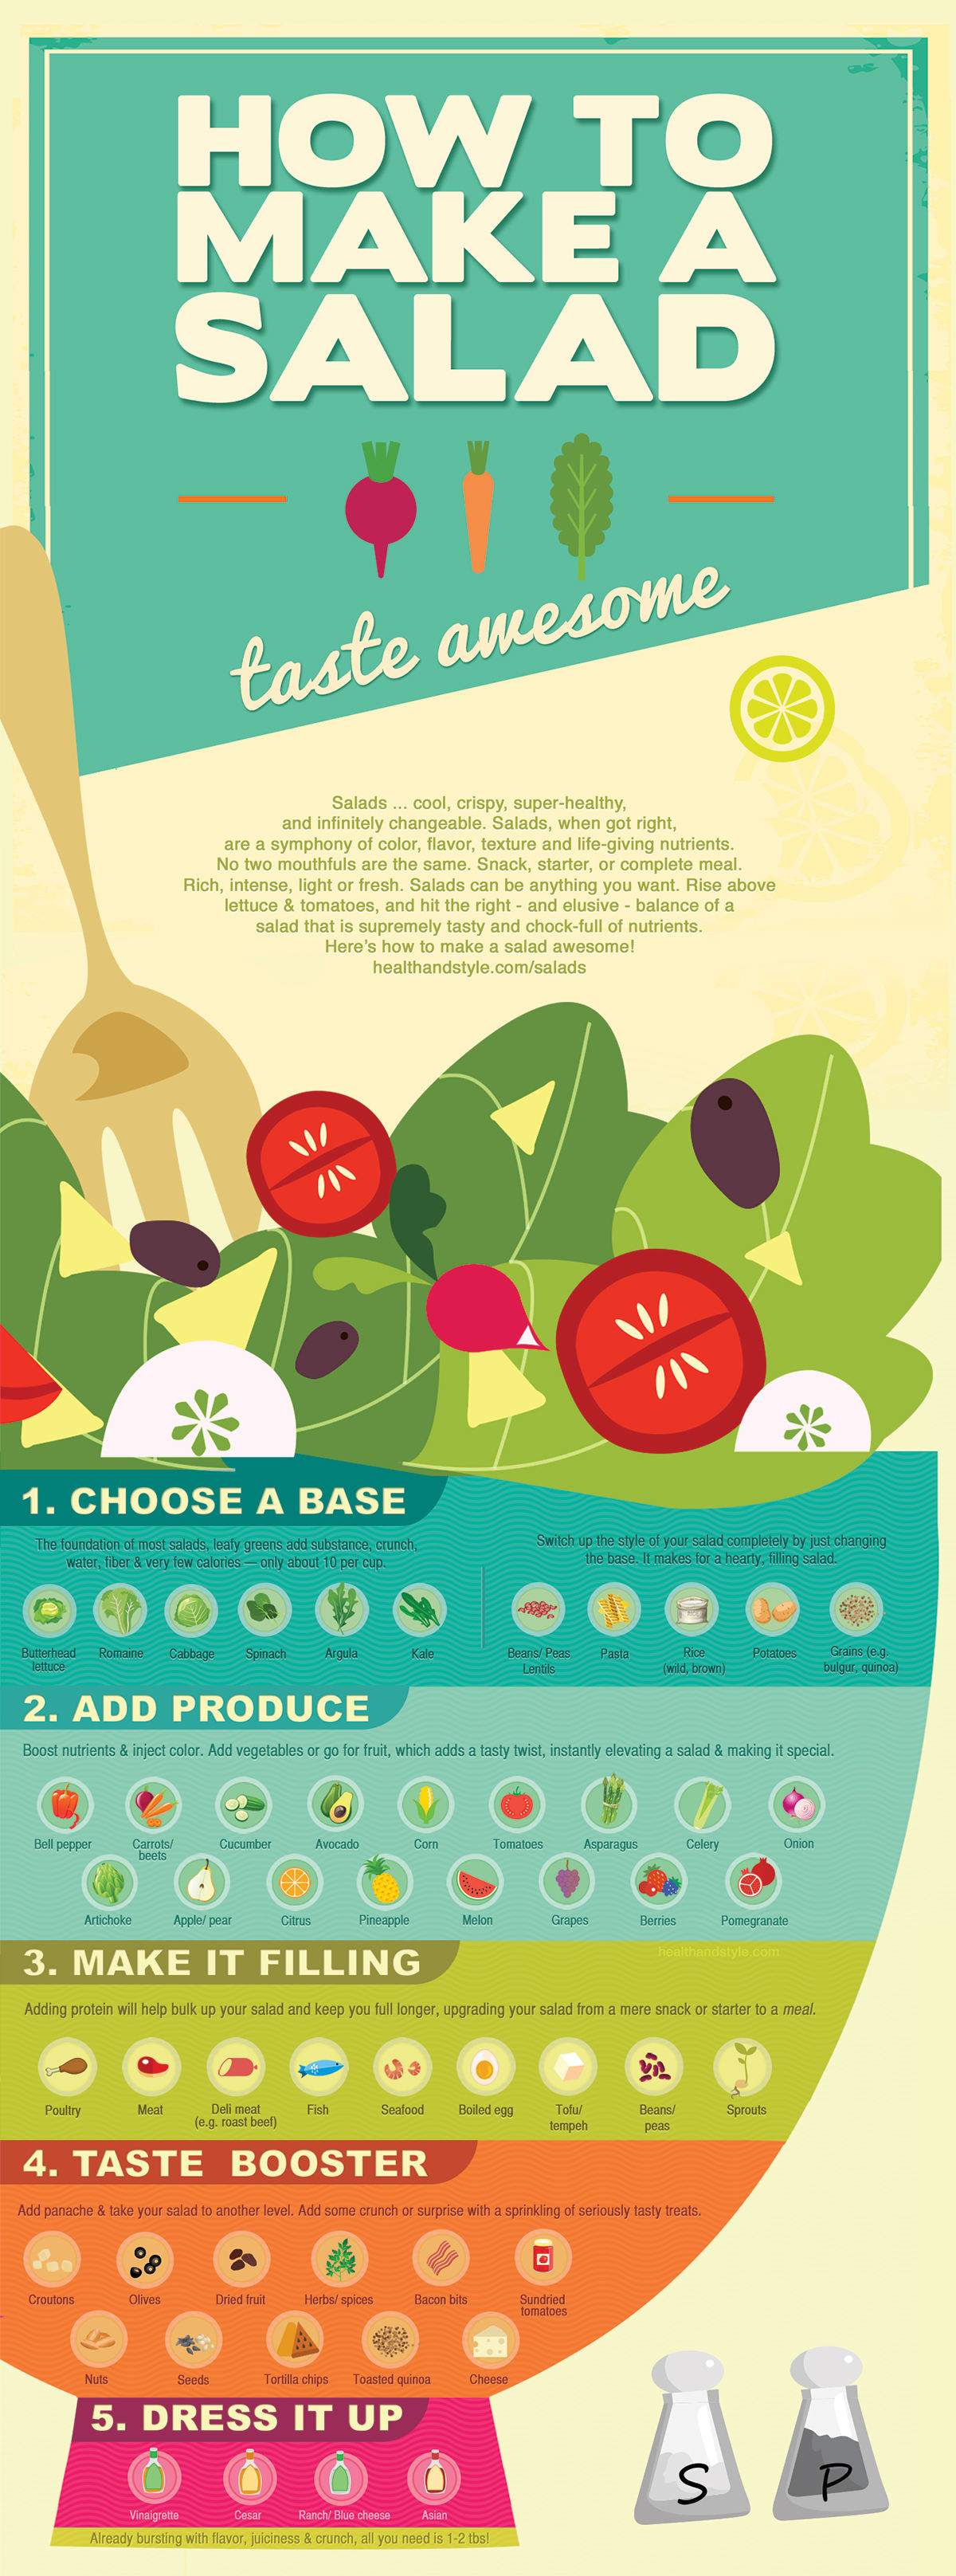 How to Make a Salad Taste Awesome